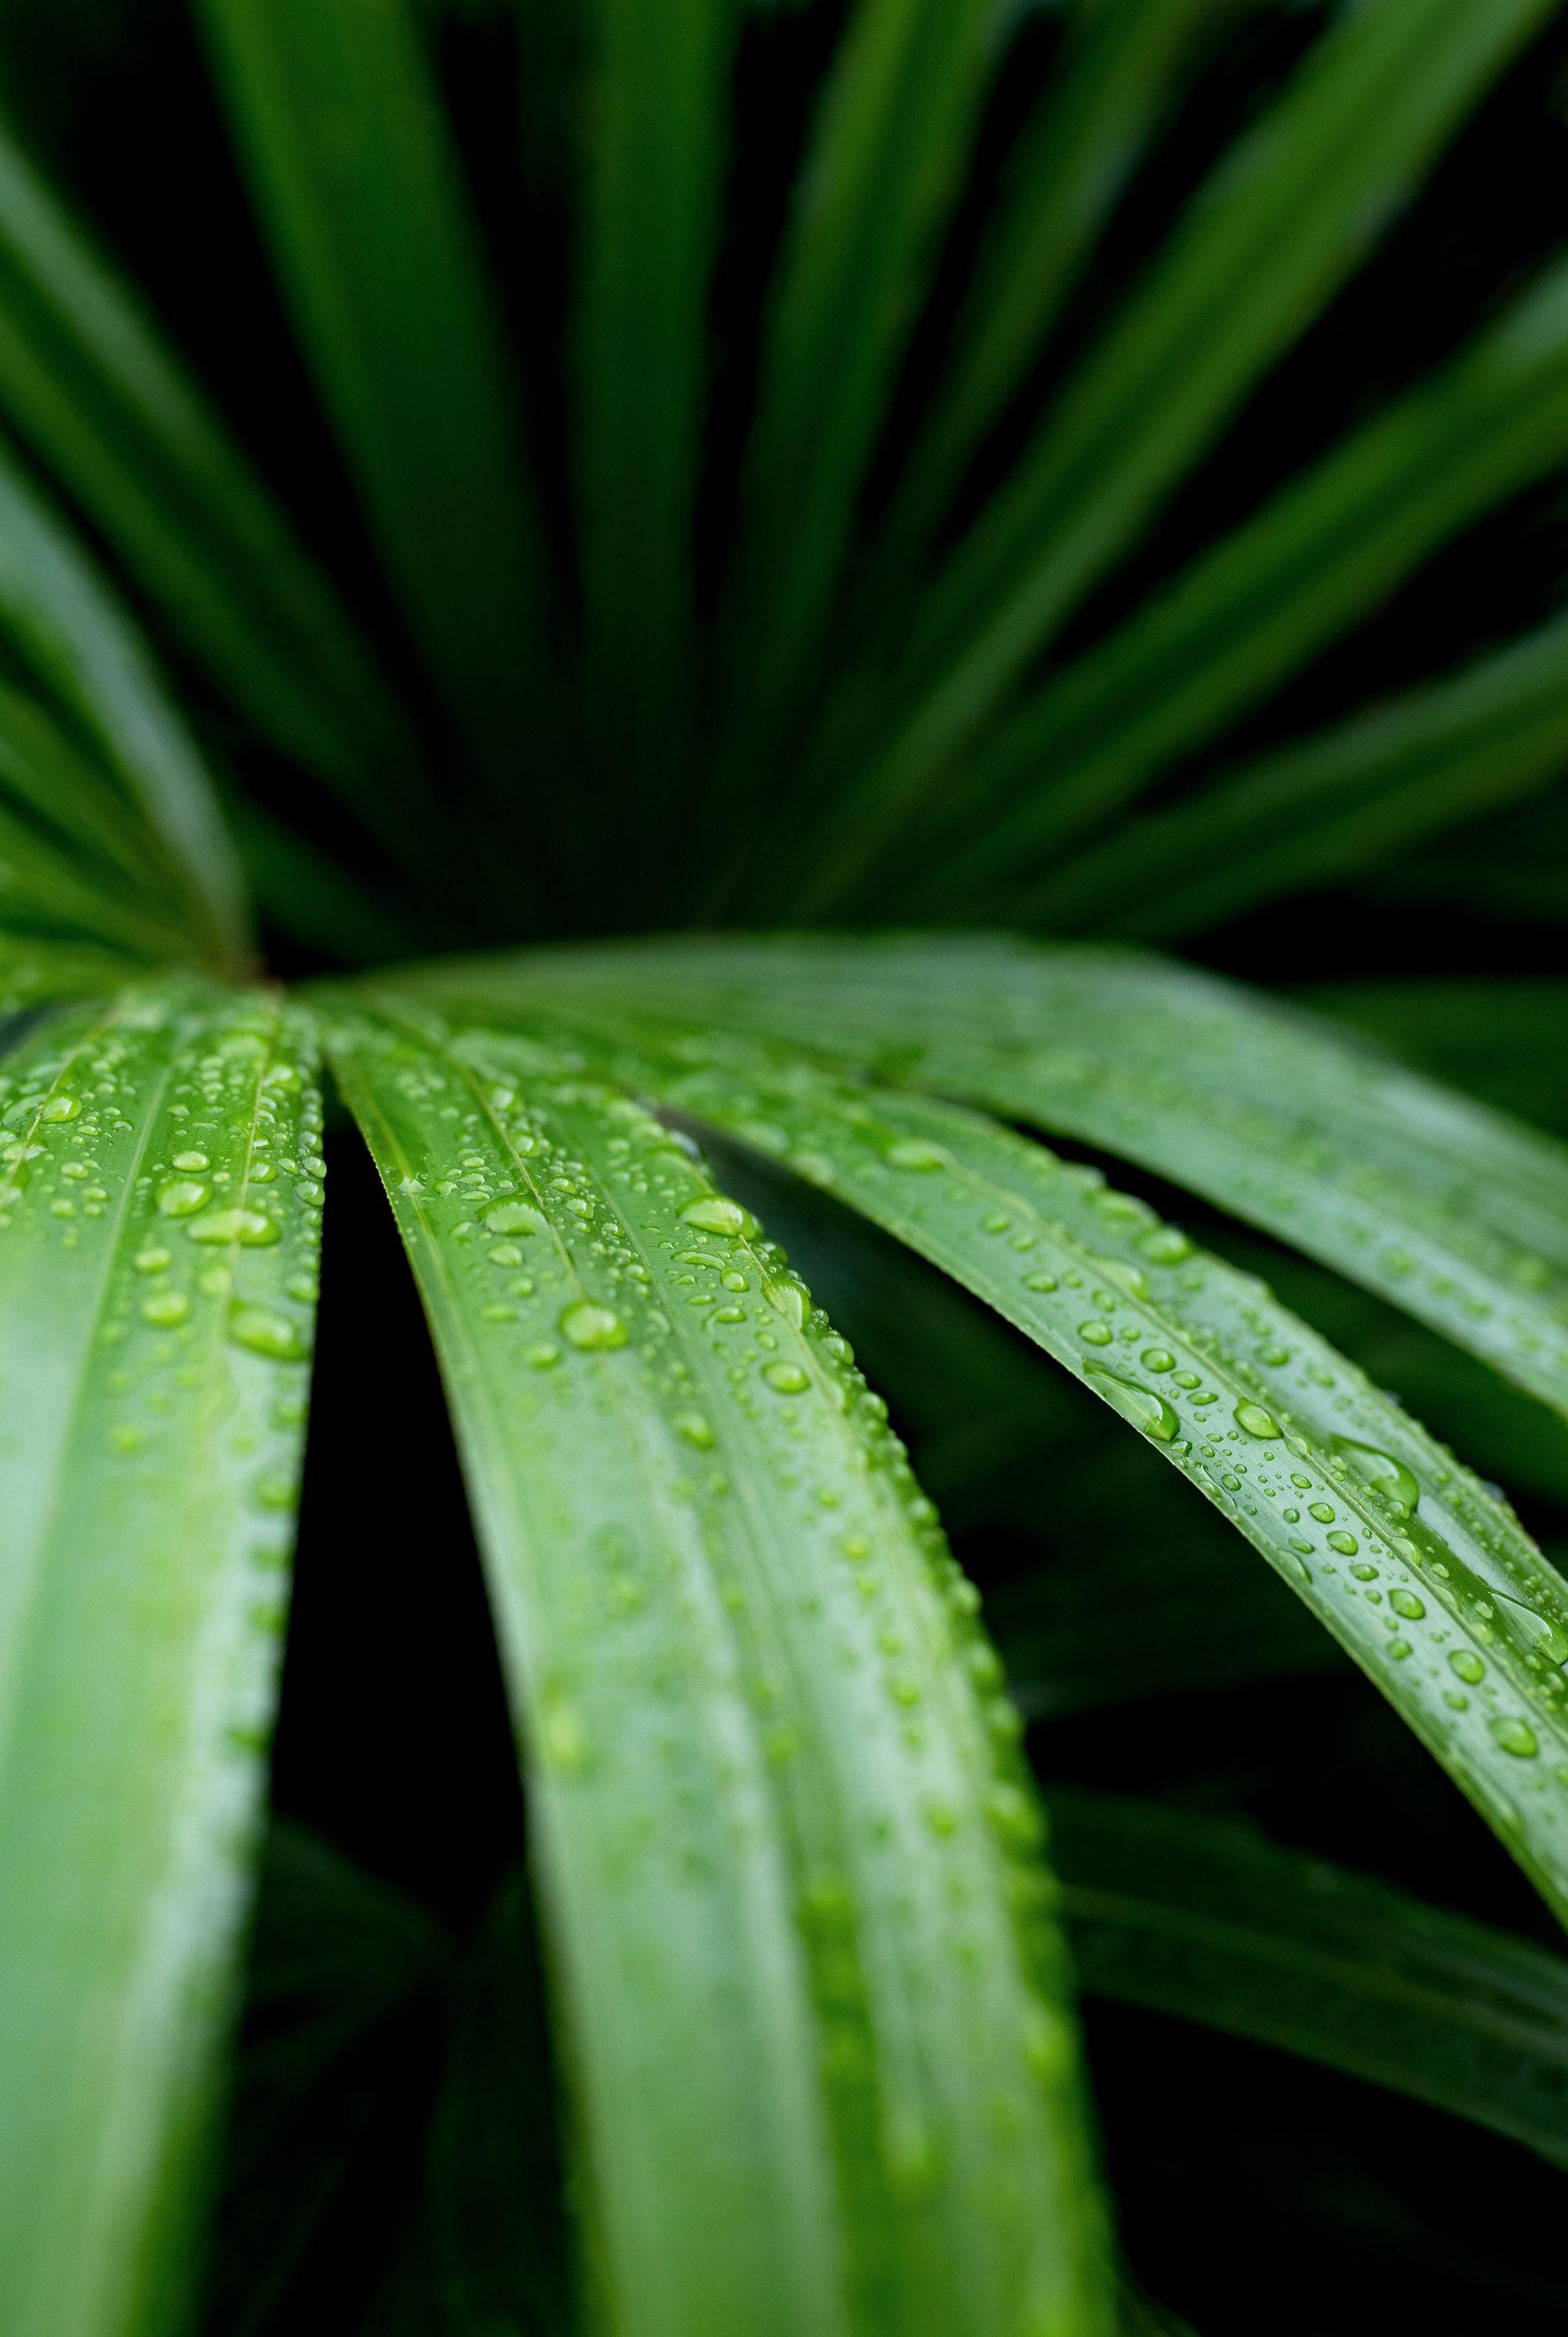 Lady palm or Rhapis palm, Rhapis excelsa